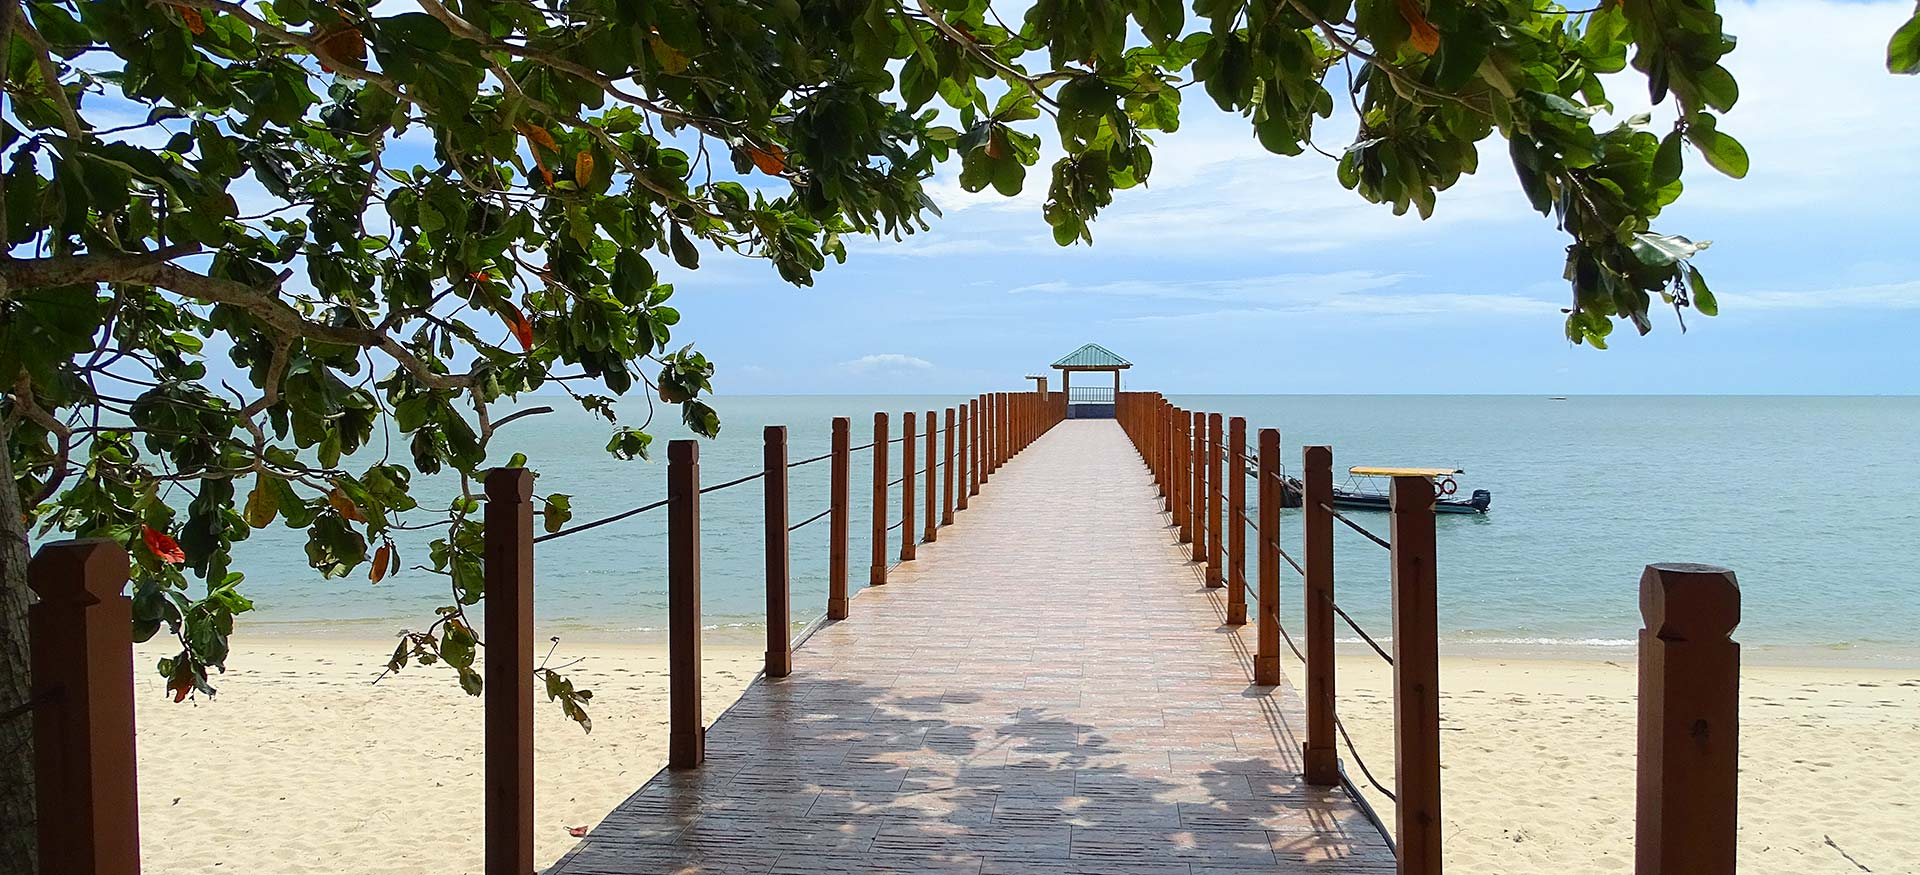 Steg am Strand in Malaysia